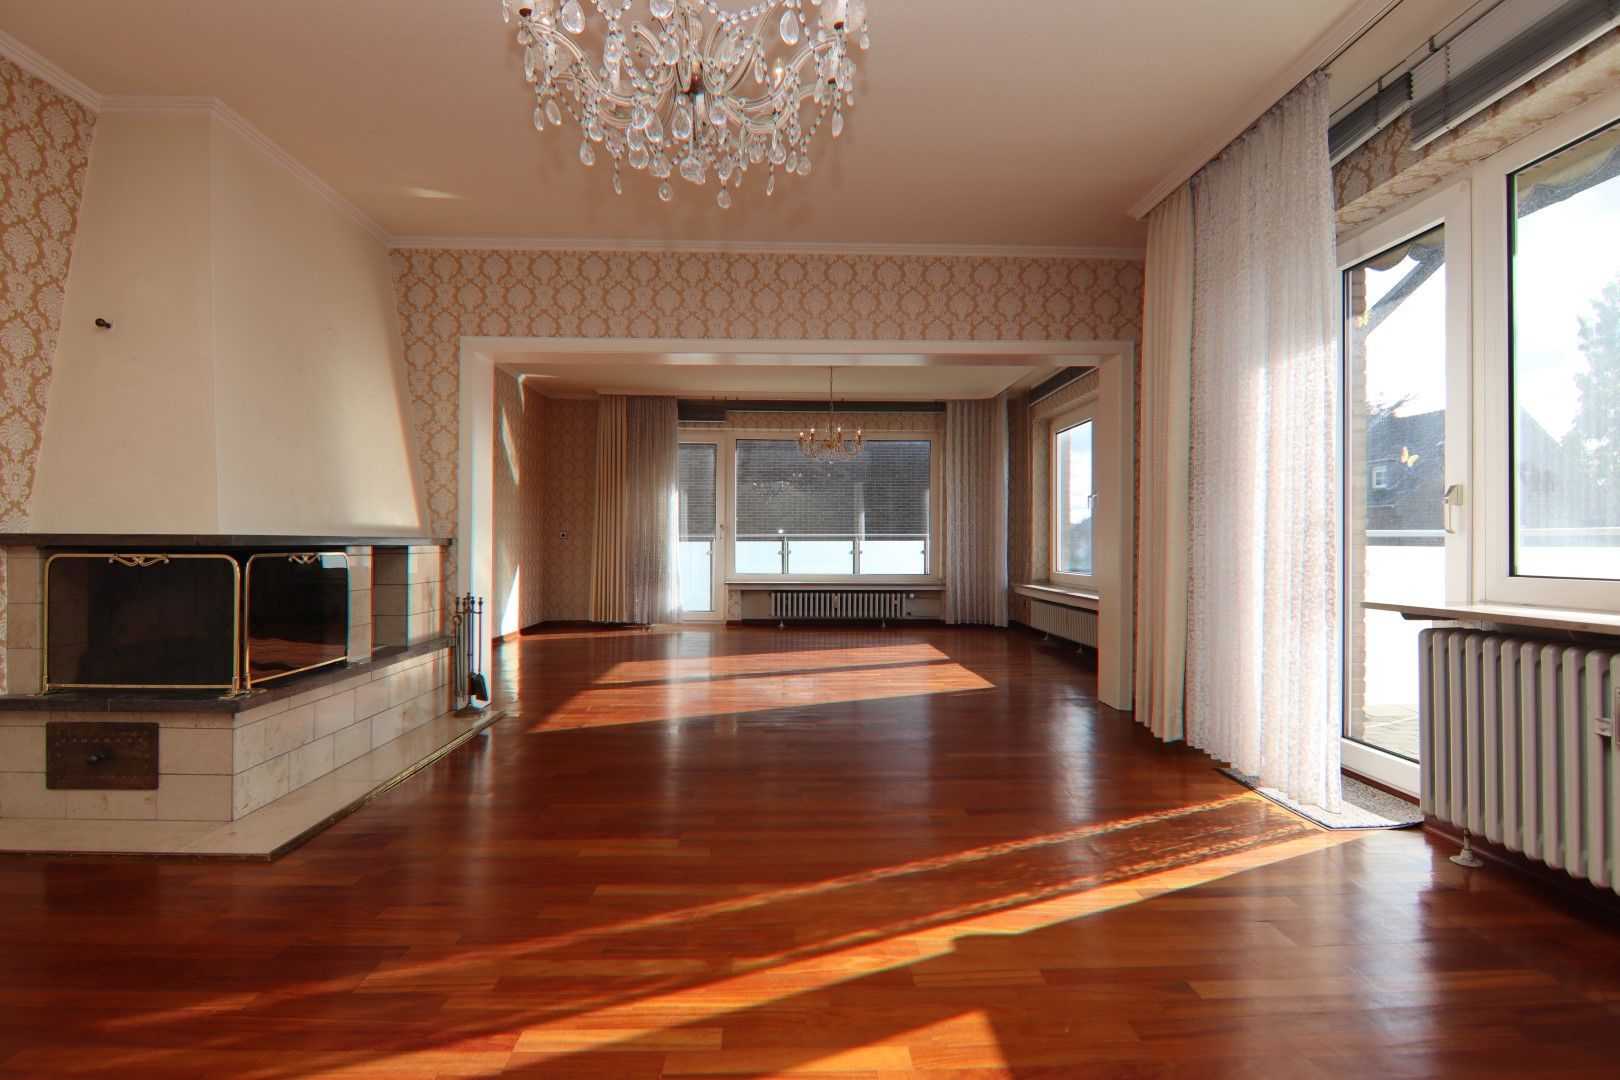 Immobilie Nr.0277 | Necklenbroicher Straße 45b, 40667 Meerbusch